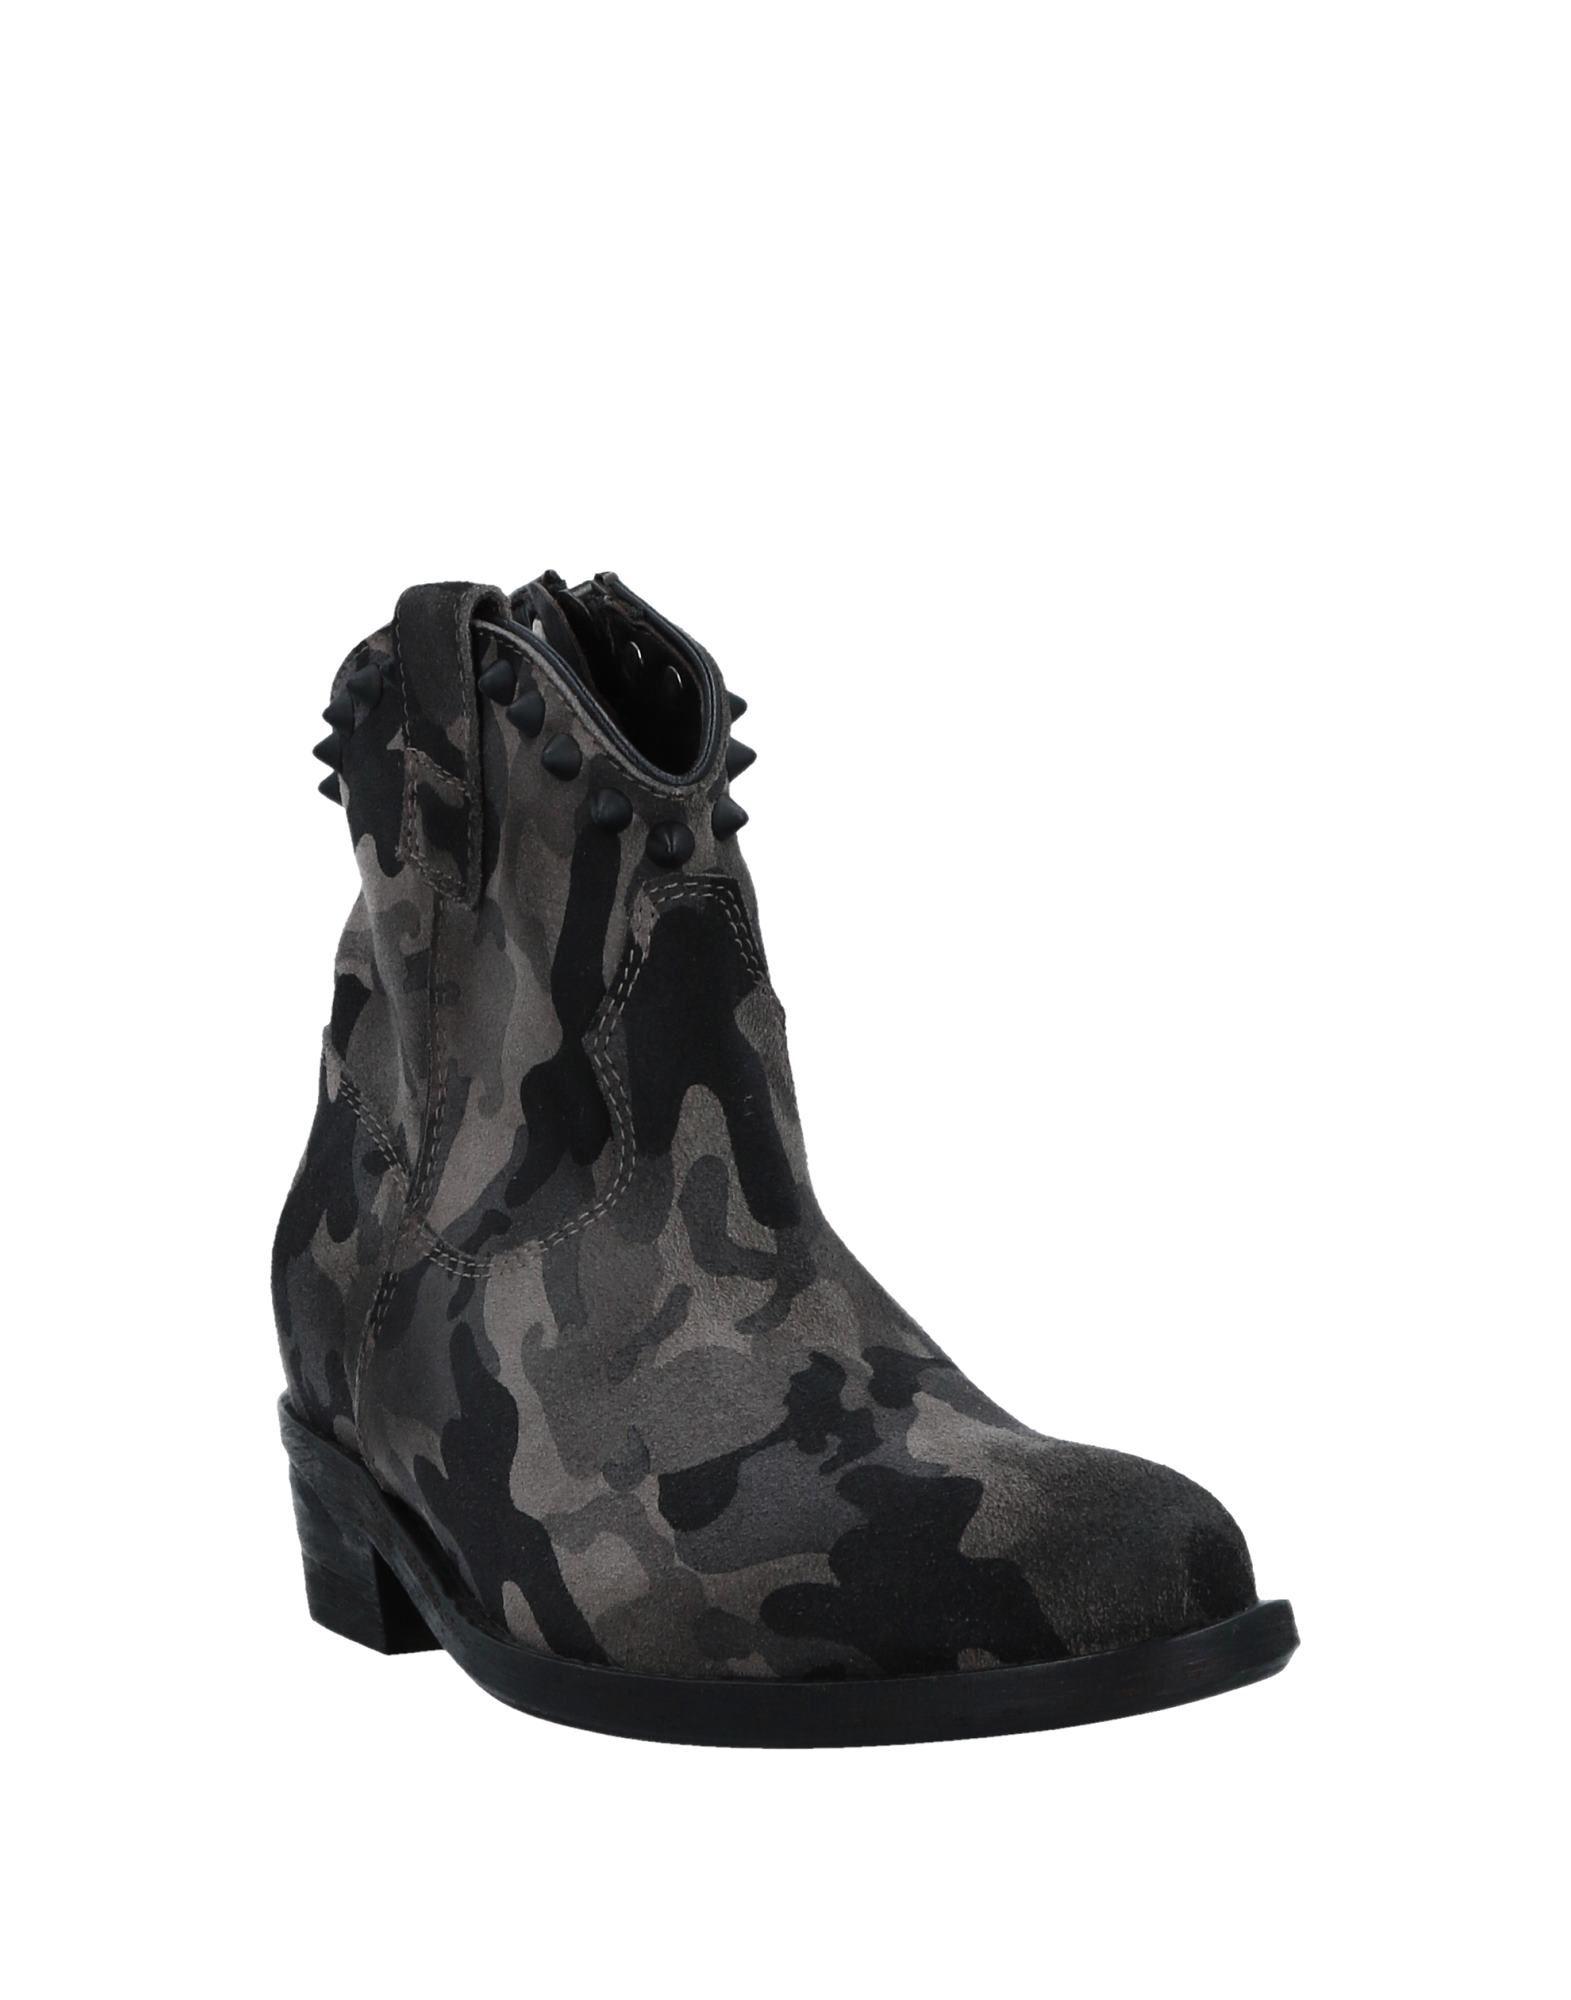 Stilvolle billige Stiefelette Schuhe Via Roma 15 Stiefelette billige Damen  11518740XM 2fbf52